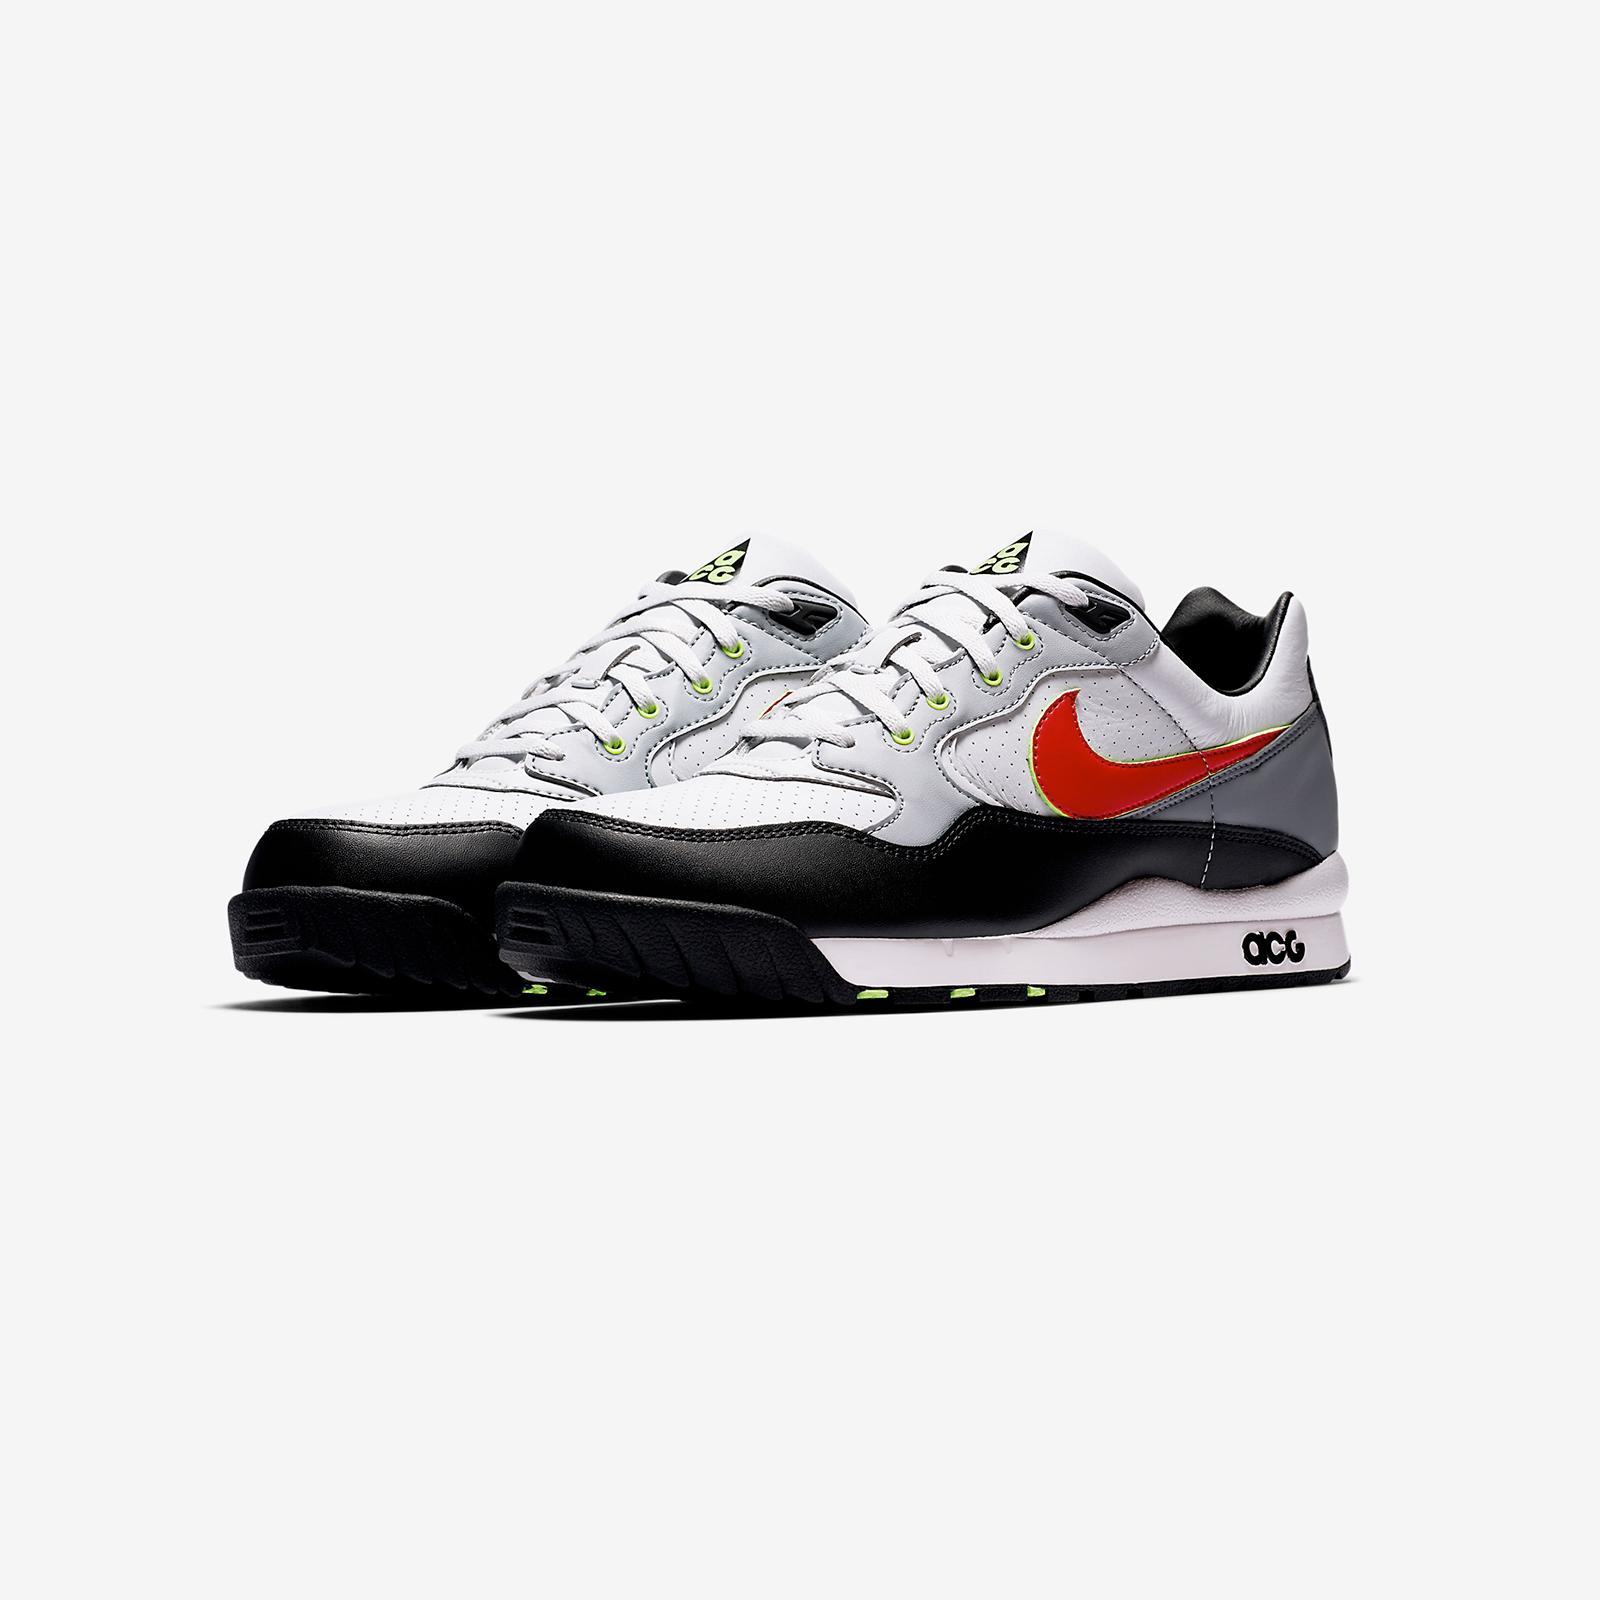 cúbico Cirugía Dispersión  Nike Air Wildwood ACG - Ao3116-001 - Sneakersnstuff I Sneakers & Streetwear  online seit 1999